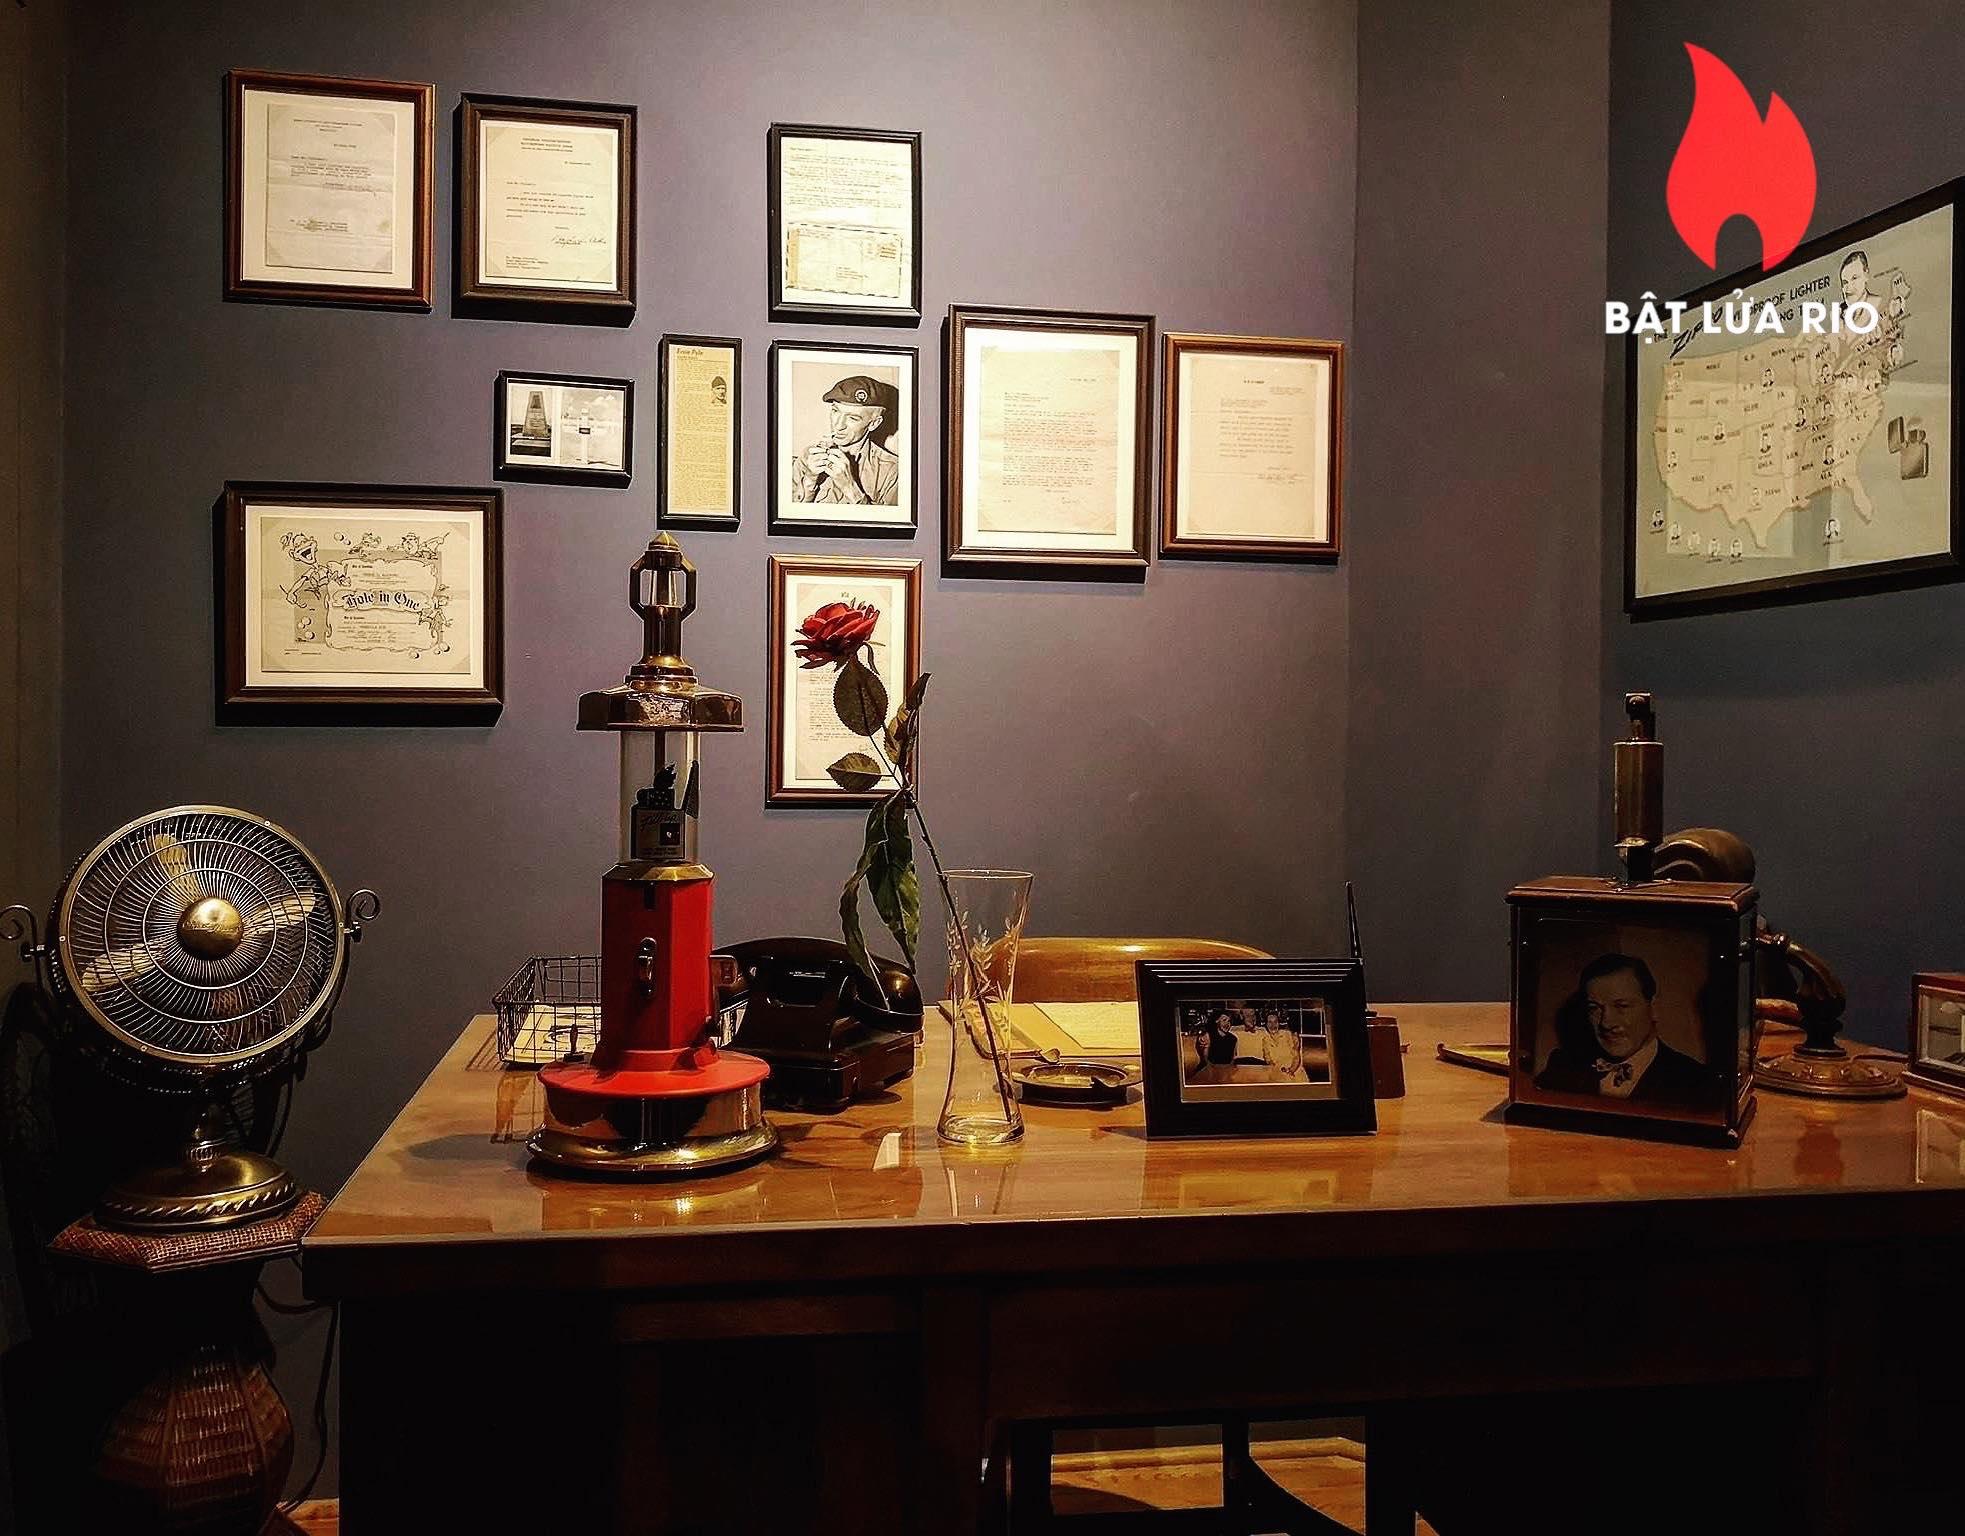 THAM QUAN BẢO TÀNG ZIPPO/CASE - ZIPPO/CASE MUSEUM 20